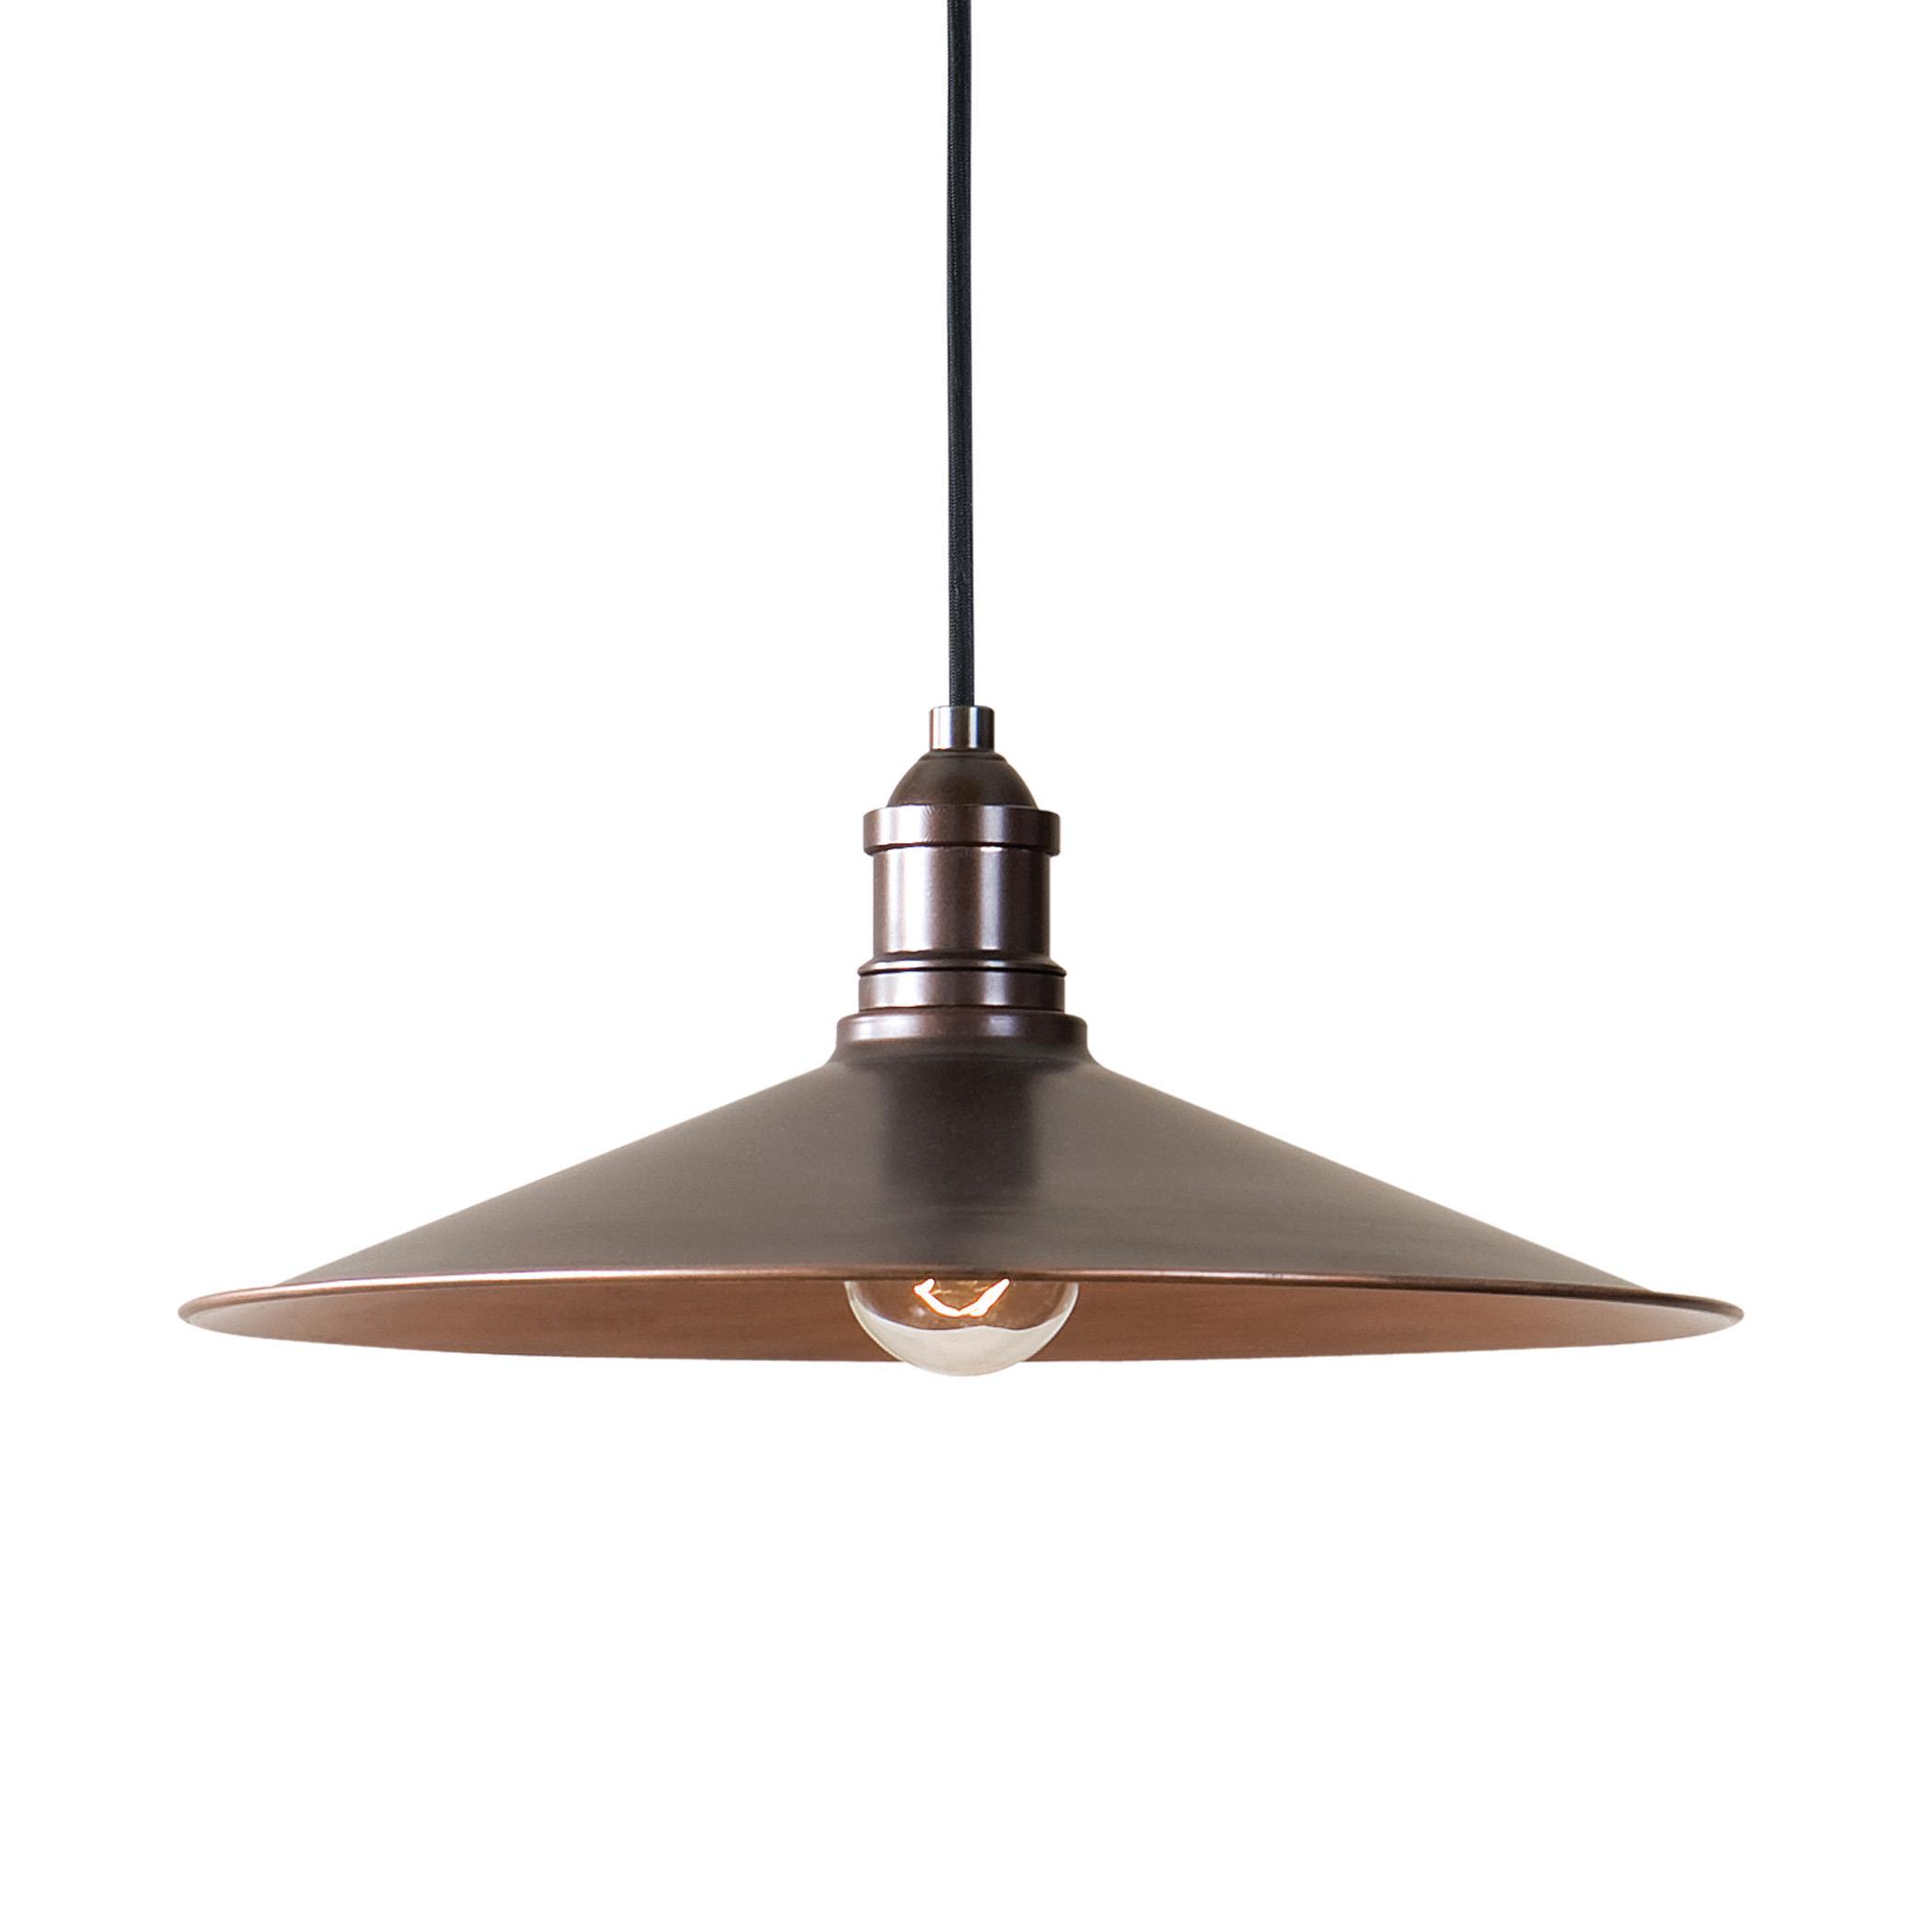 Uttermost Lighting Fixtures Barnstead 1 Light Copper Pendant - Item Number: 22051